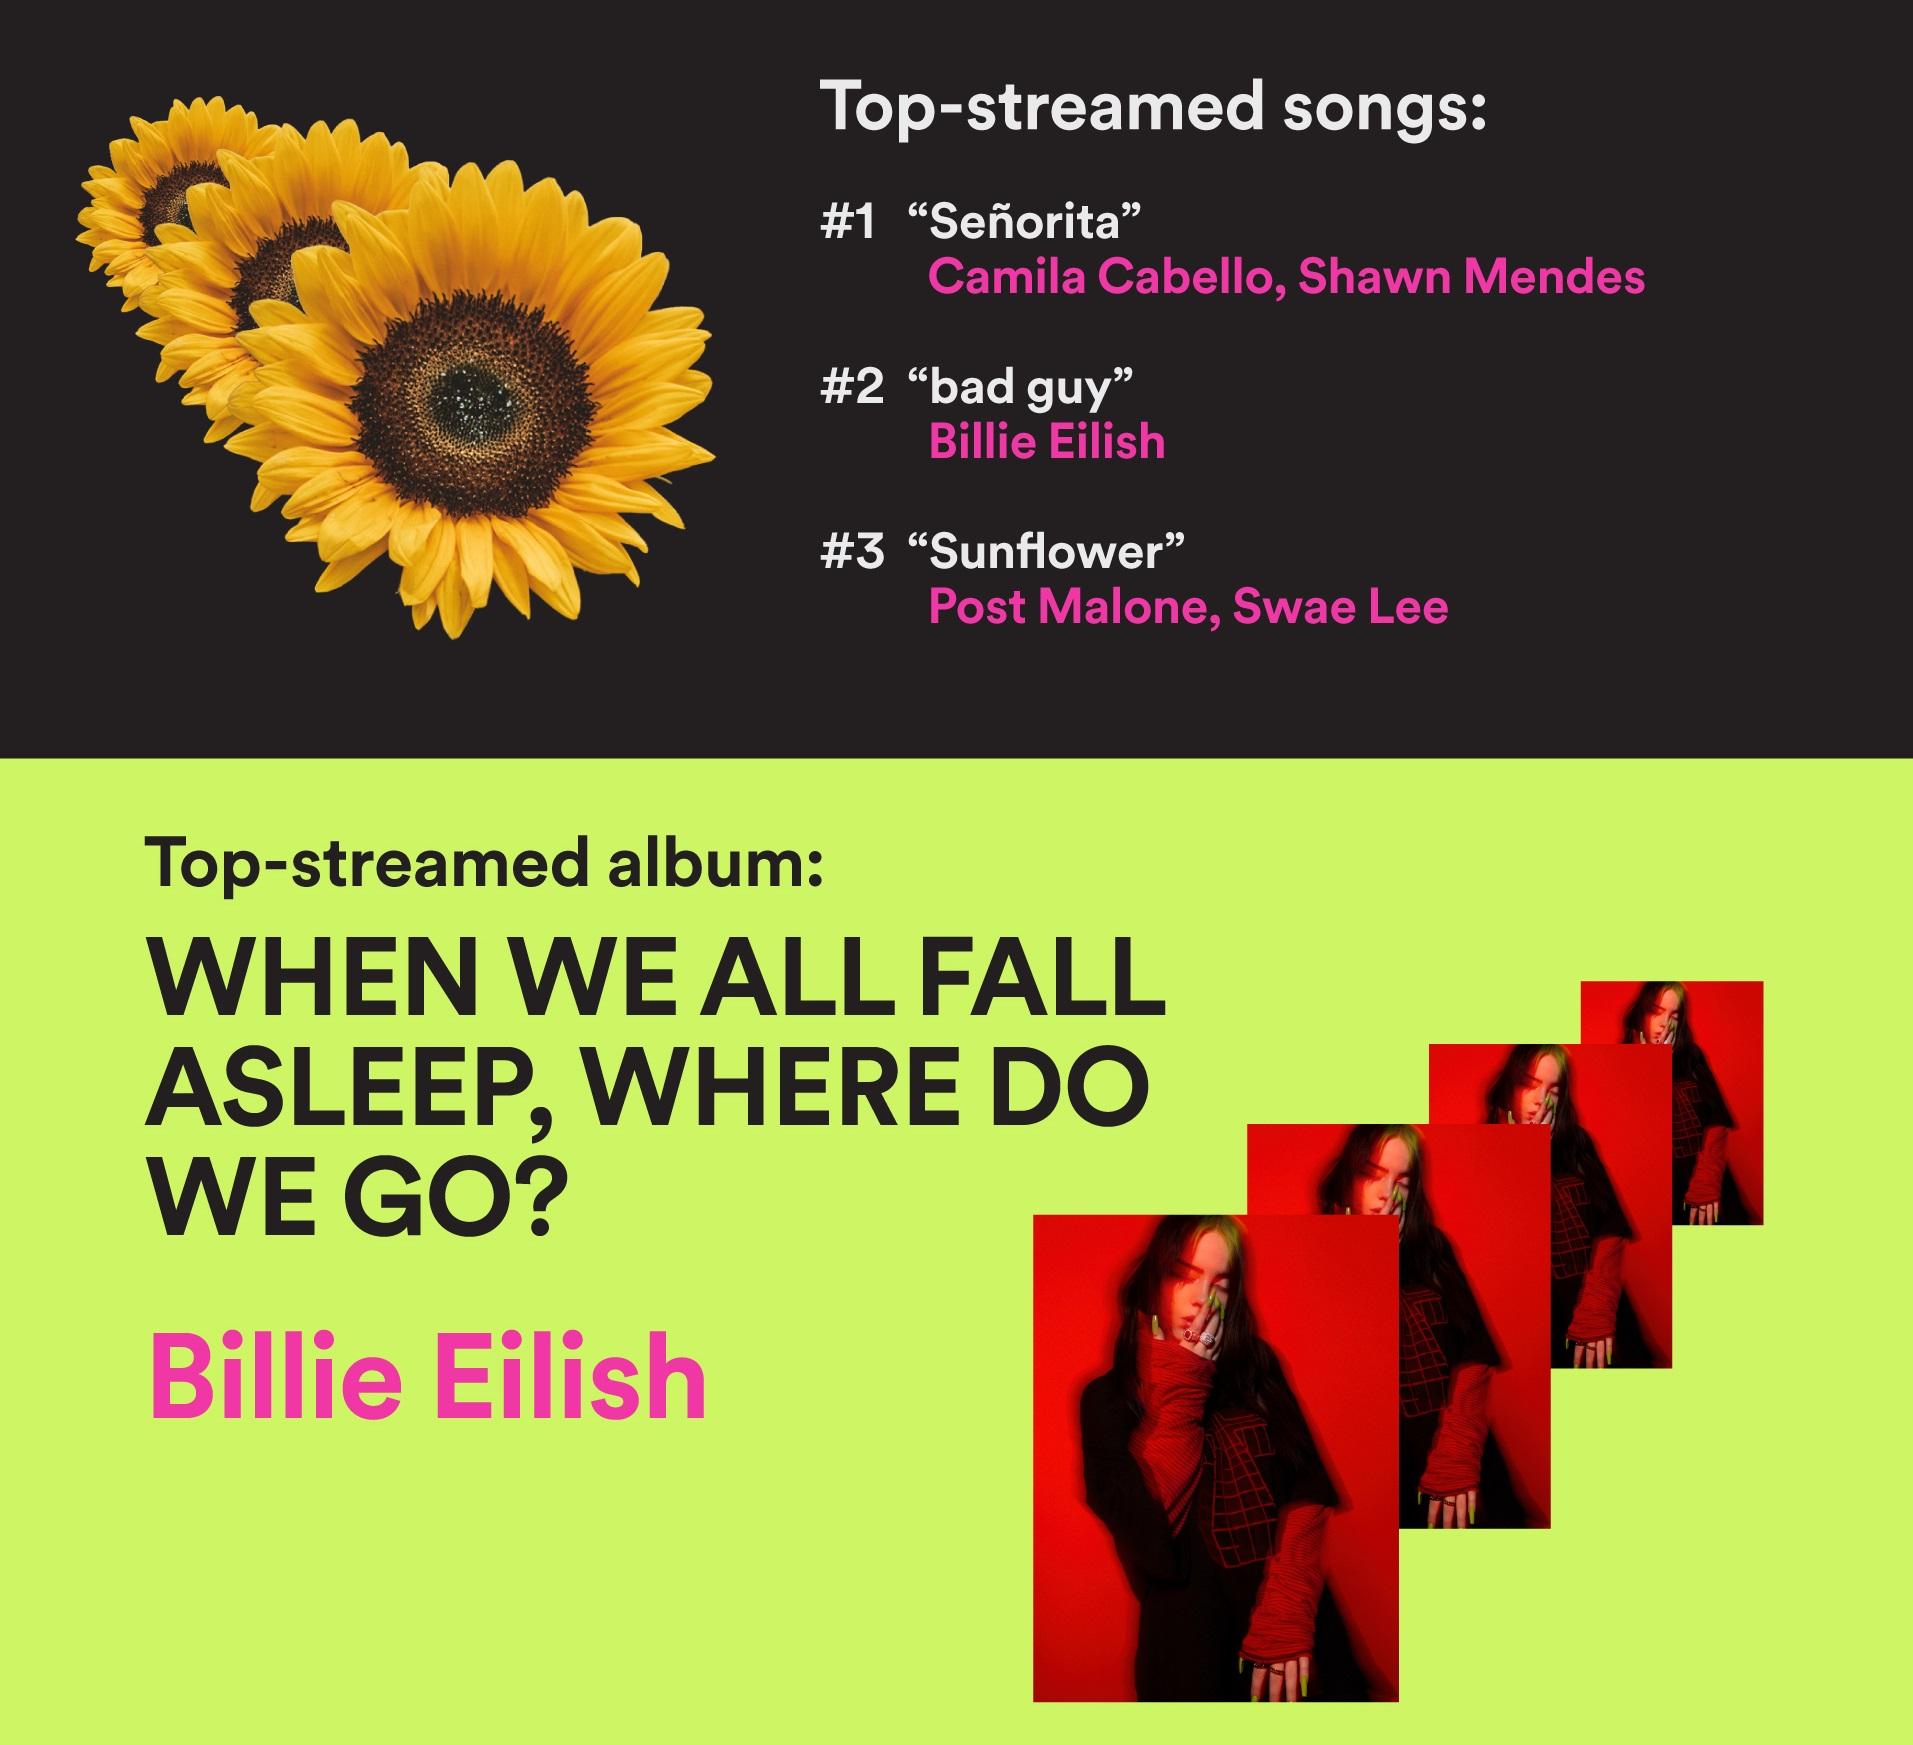 Spotify เผยอันดับเพลงและศิลปินยอดนิยม BTS ยอดสตรีมสูงสุดในไทย Post Malone ครองอันดับ 1 โลก